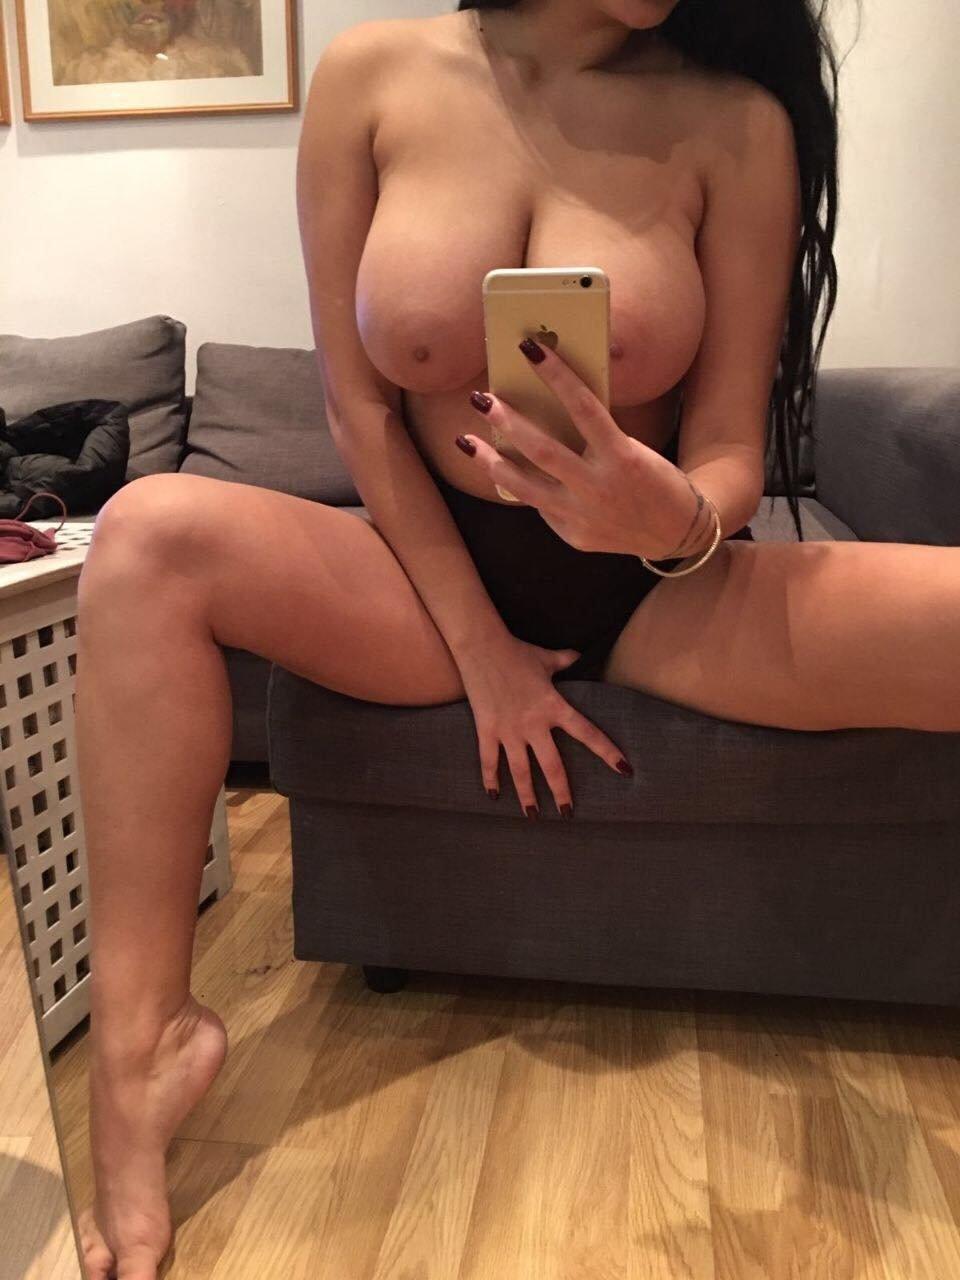 Victoria Gold Russian Escort Foot Fetish Lap Dancing Massage Muscat ...